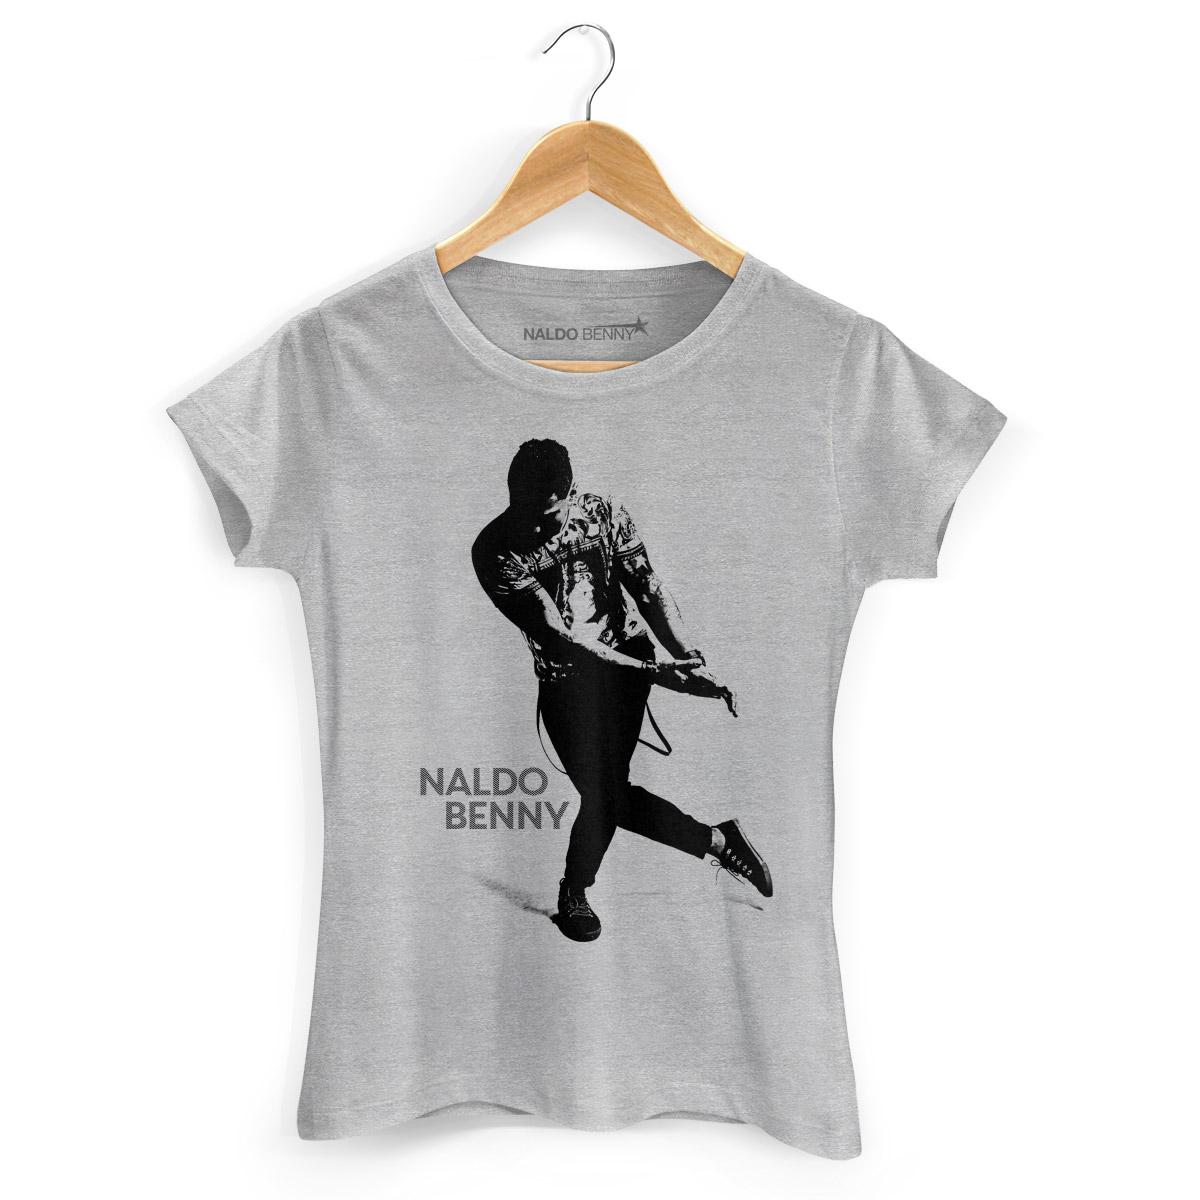 Camiseta Feminina Naldo Benny Se Joga